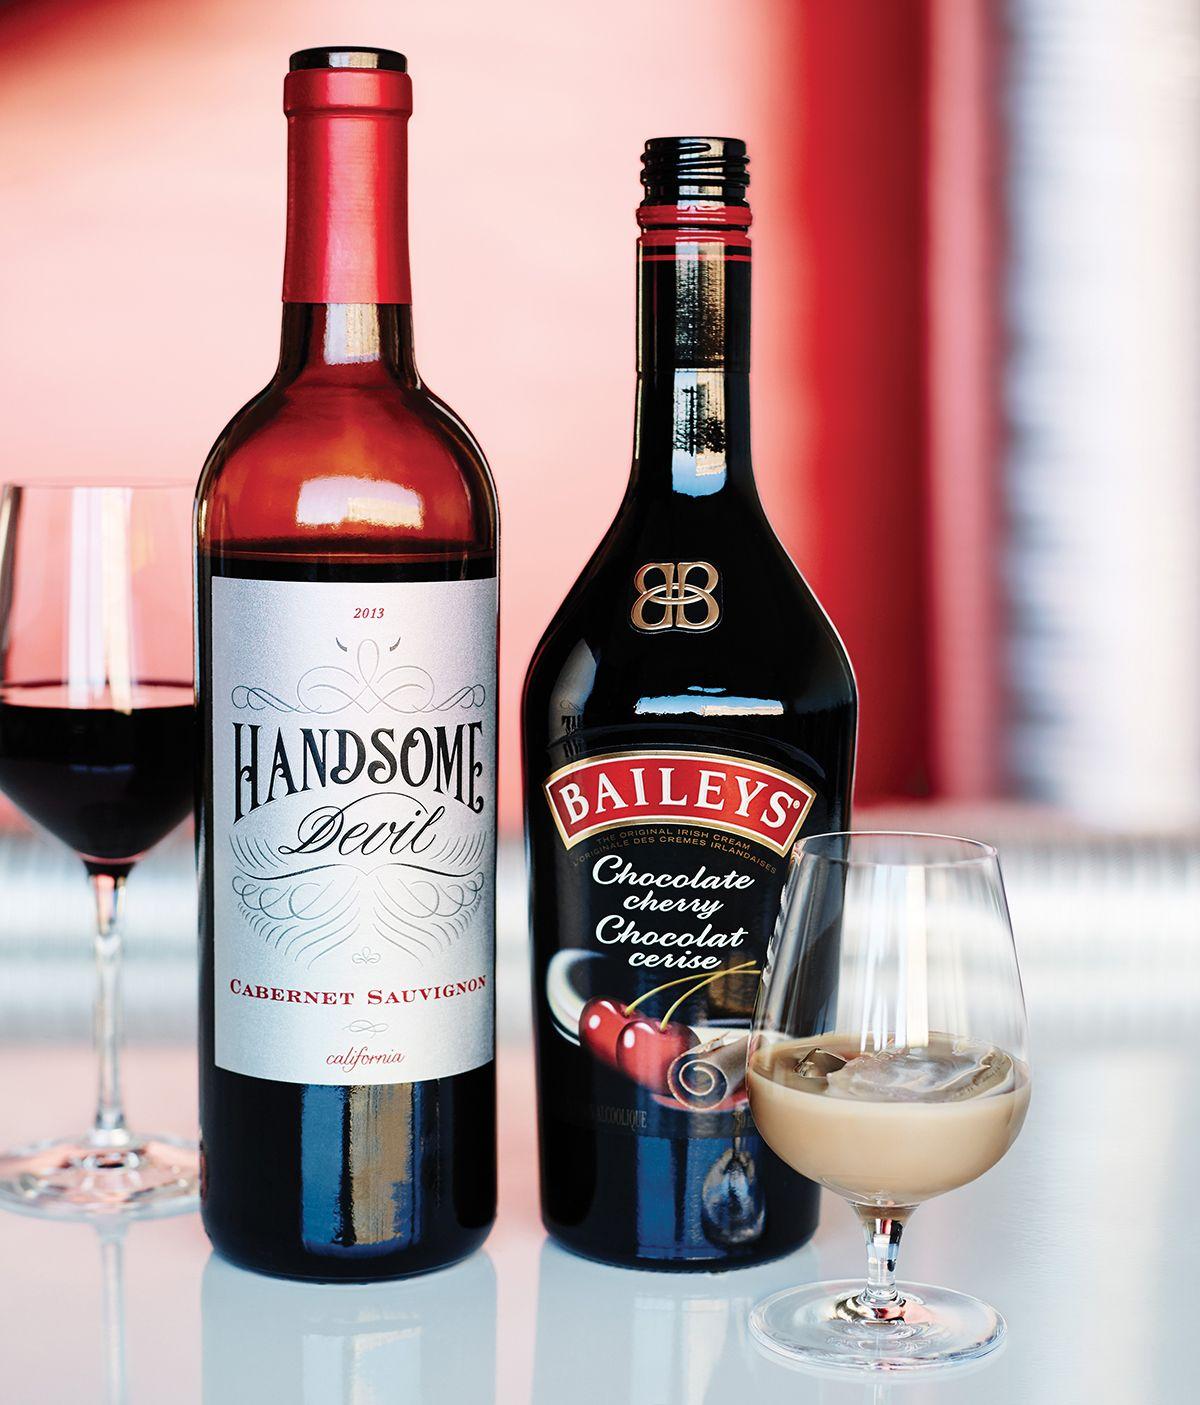 Vin Rouge Handsomedevil Et Baileys Choco Cerise Des Choix Seduisants Drinks Red Wine Alcohol